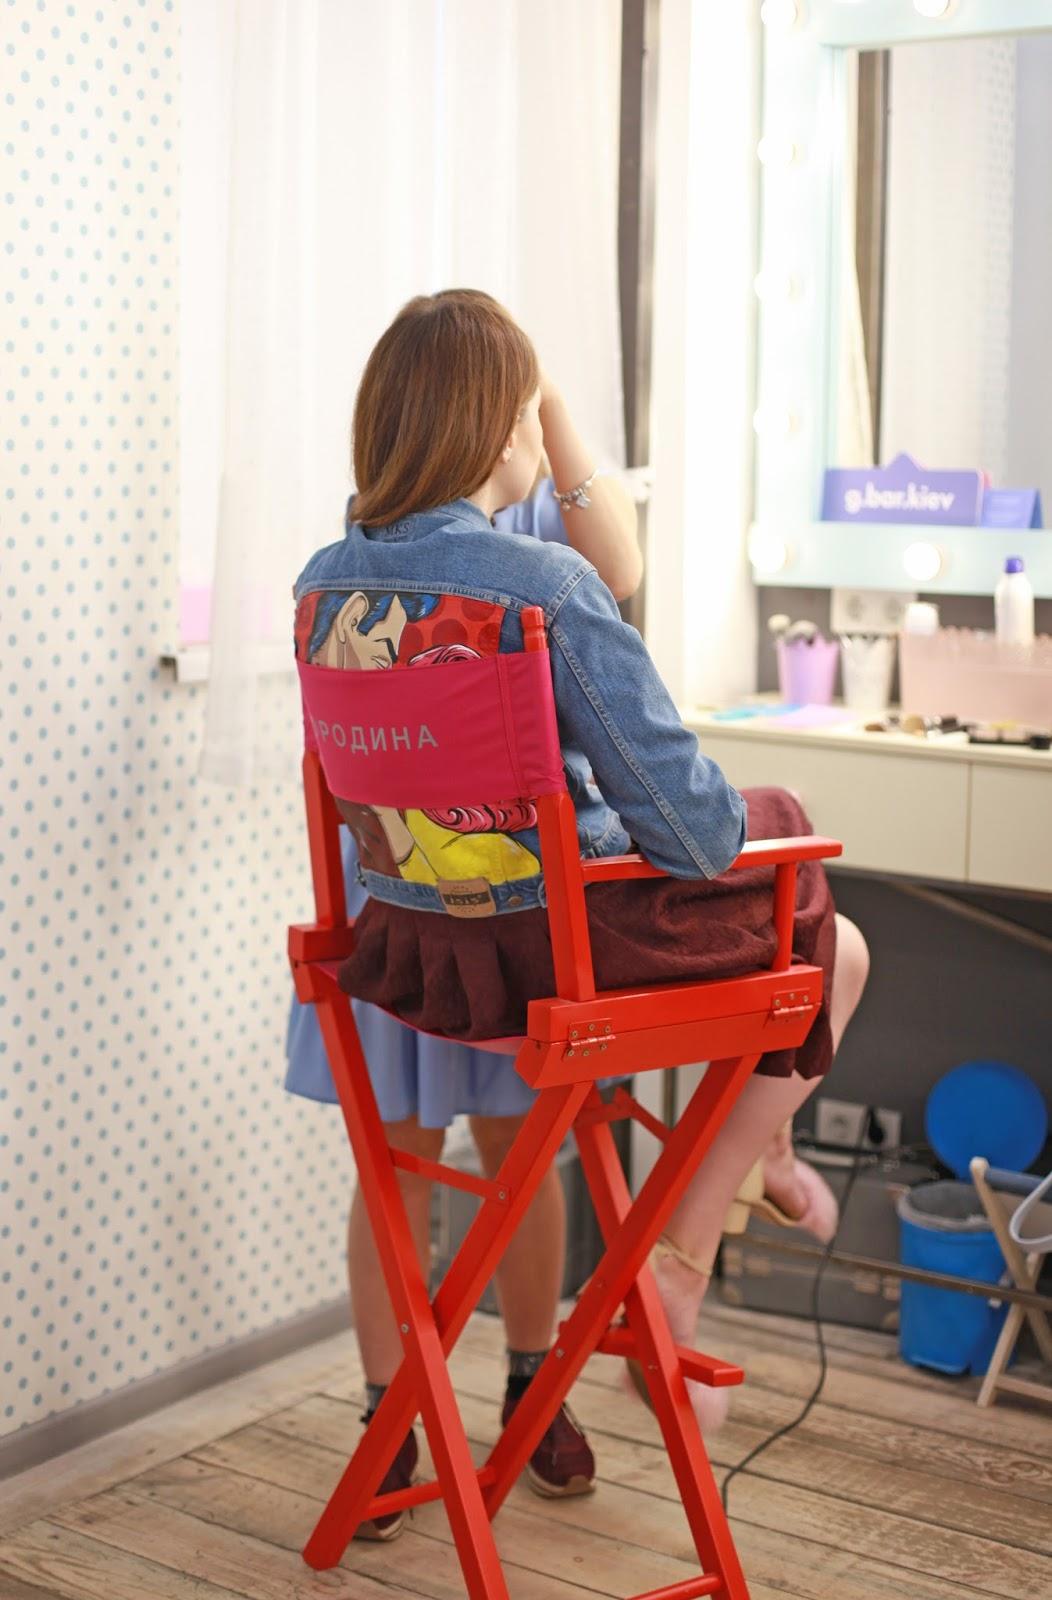 G bar киев, G bar отзывы, салон красоты, фешн блогер, beauty blogger